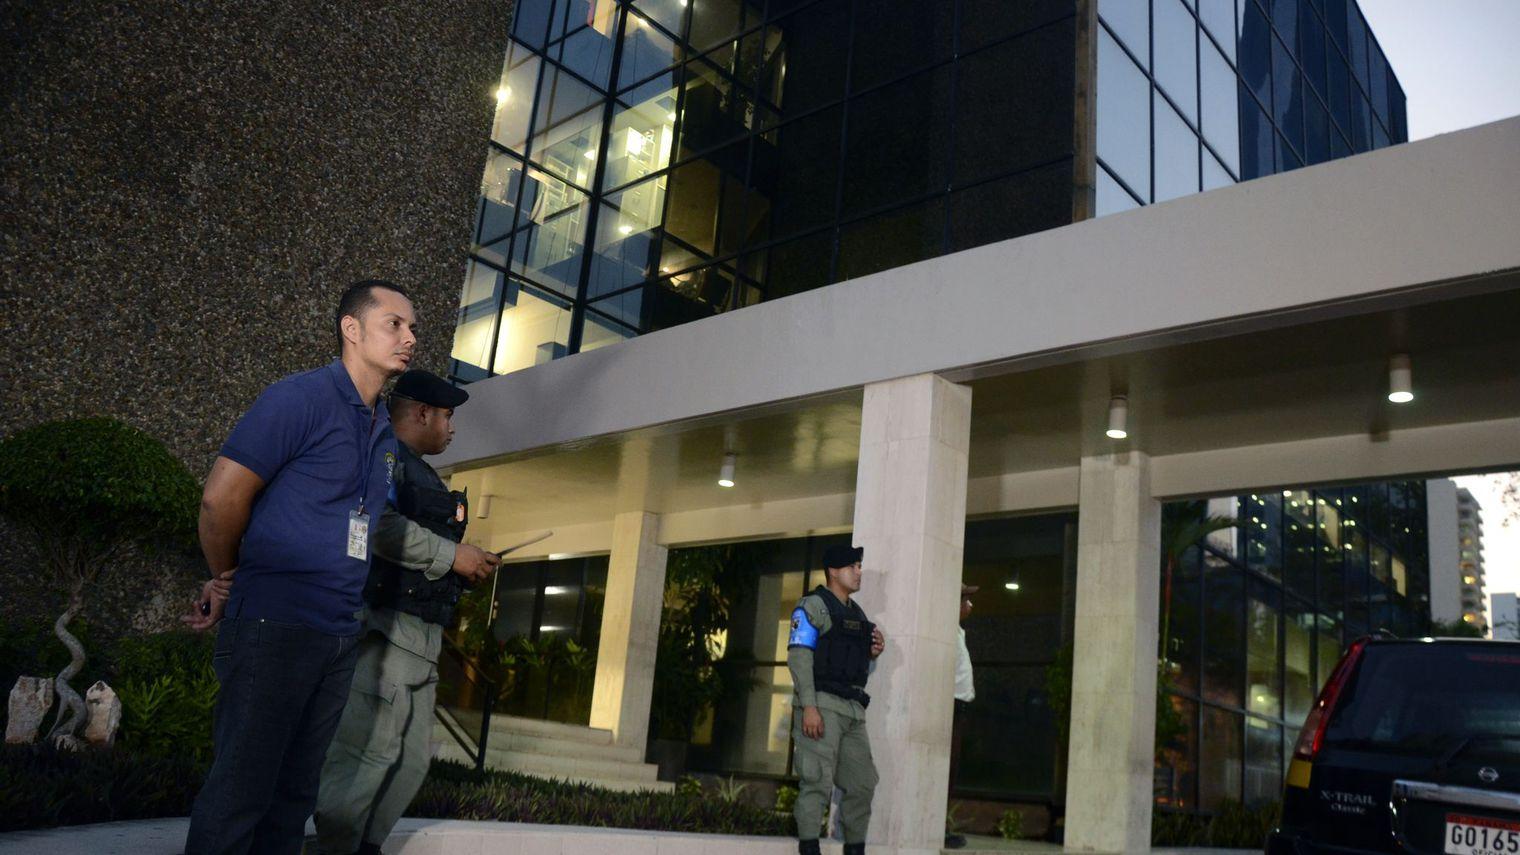 La justice écarte momentanément toute mesure contre Mossack Fonseca